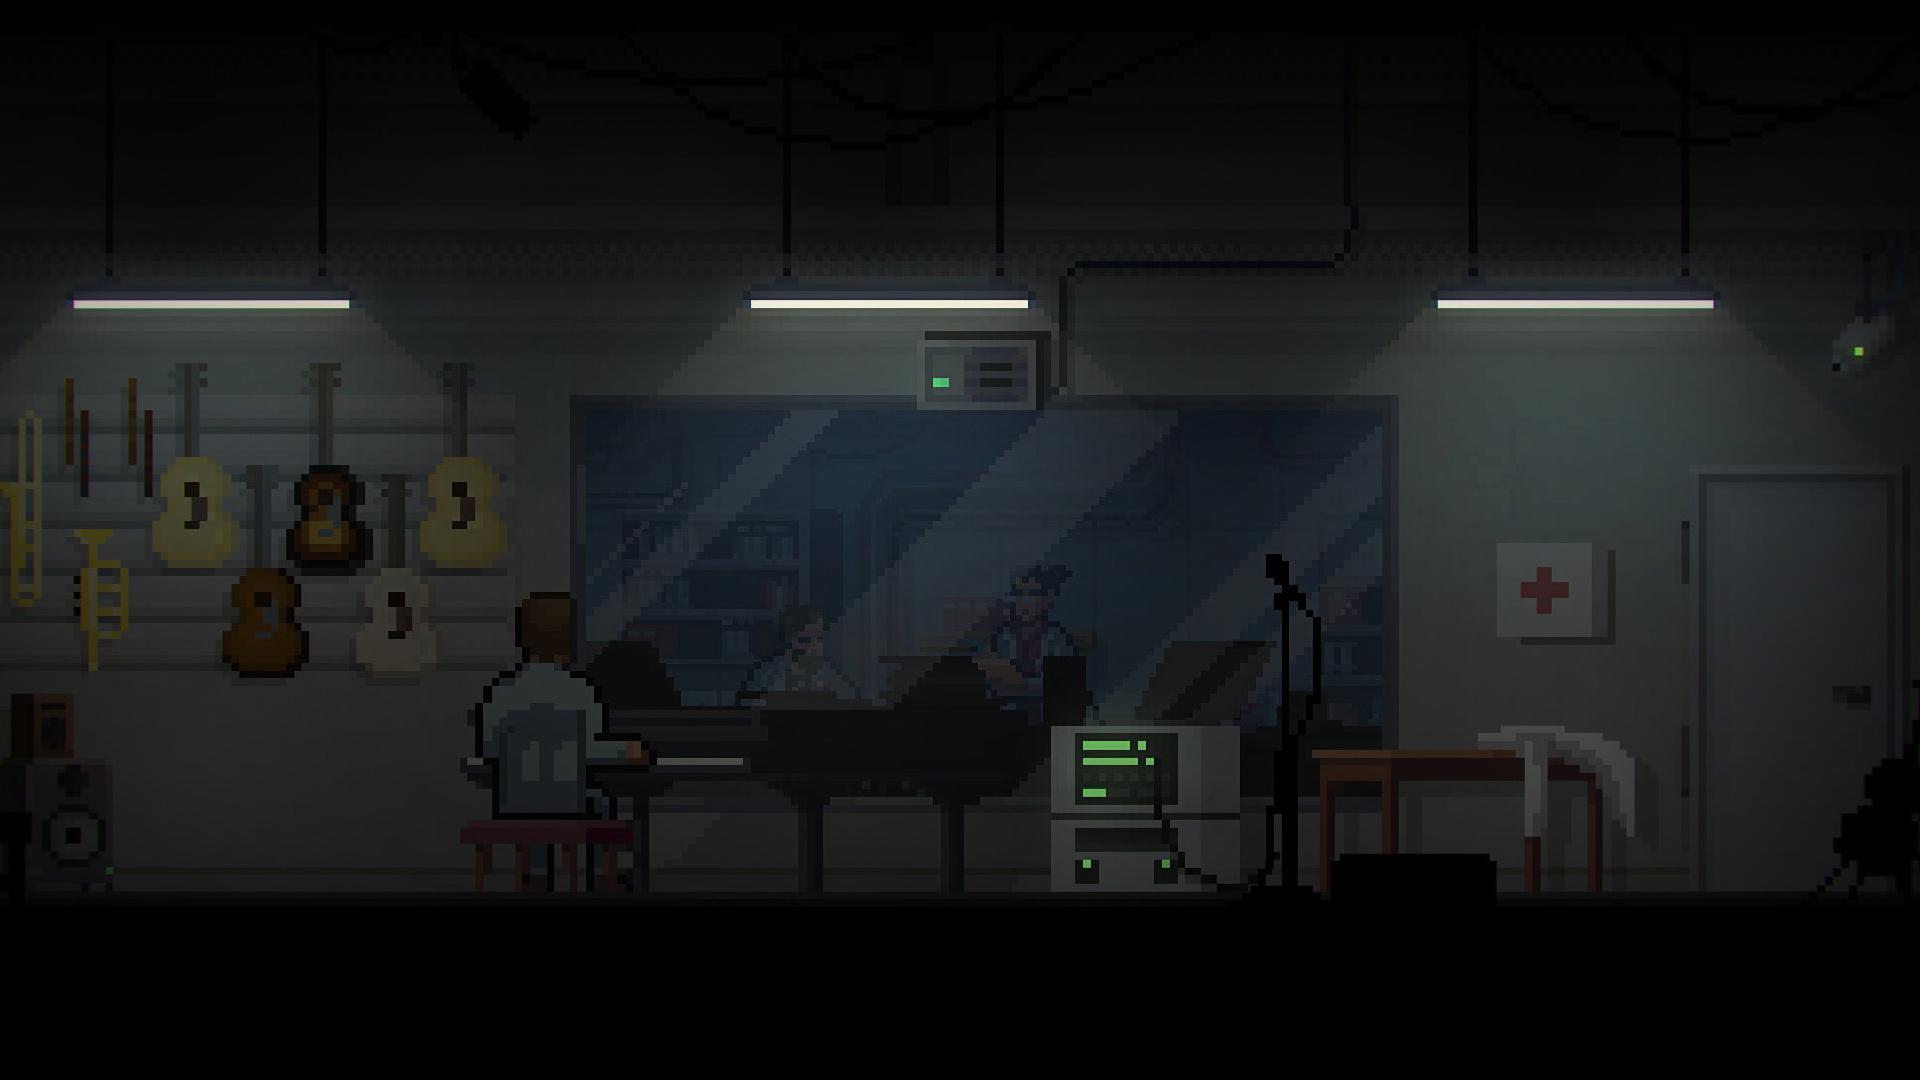 LR_07